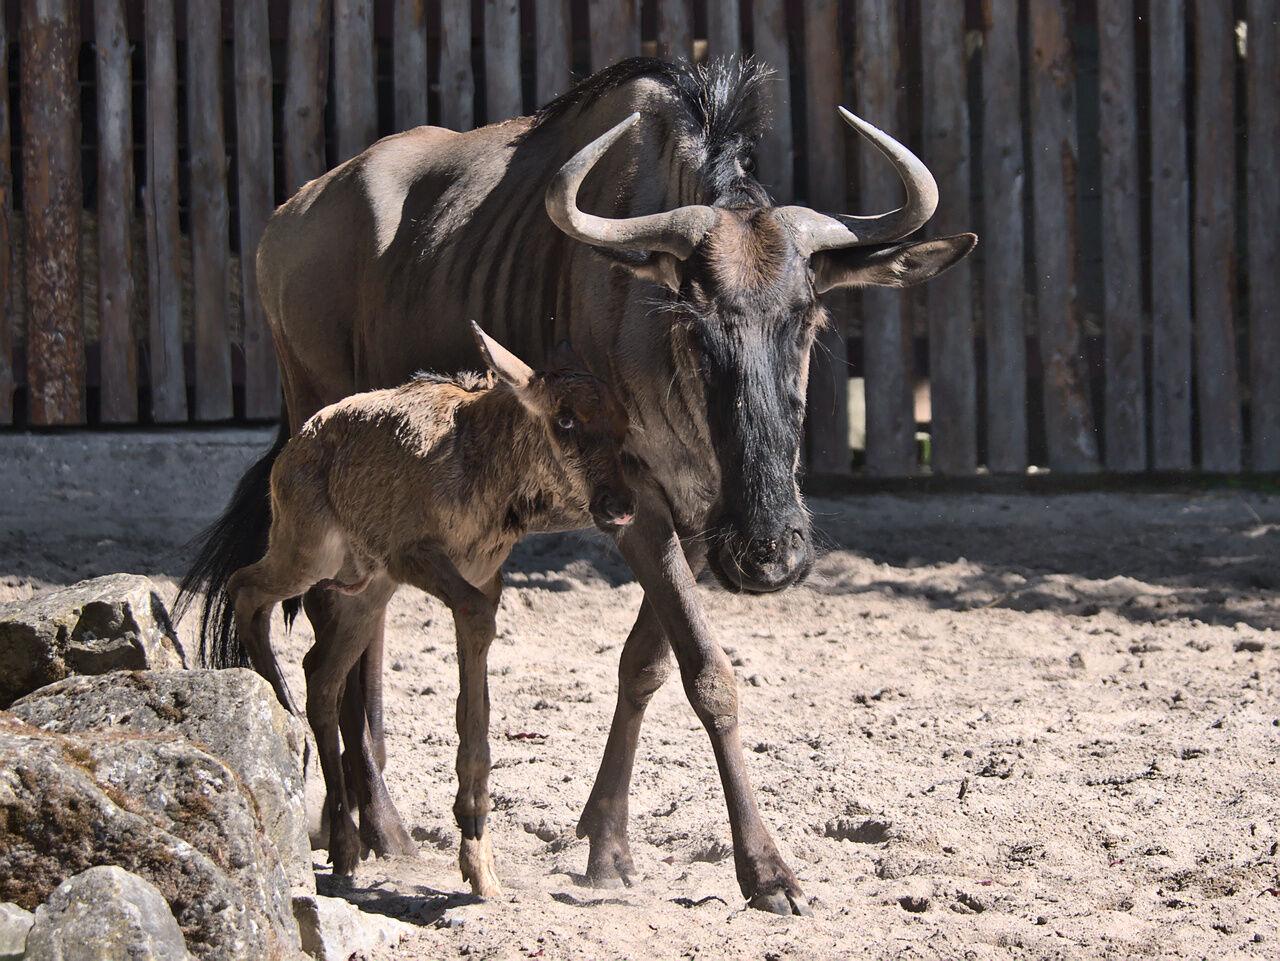 20200524_Zoo_Landau_014